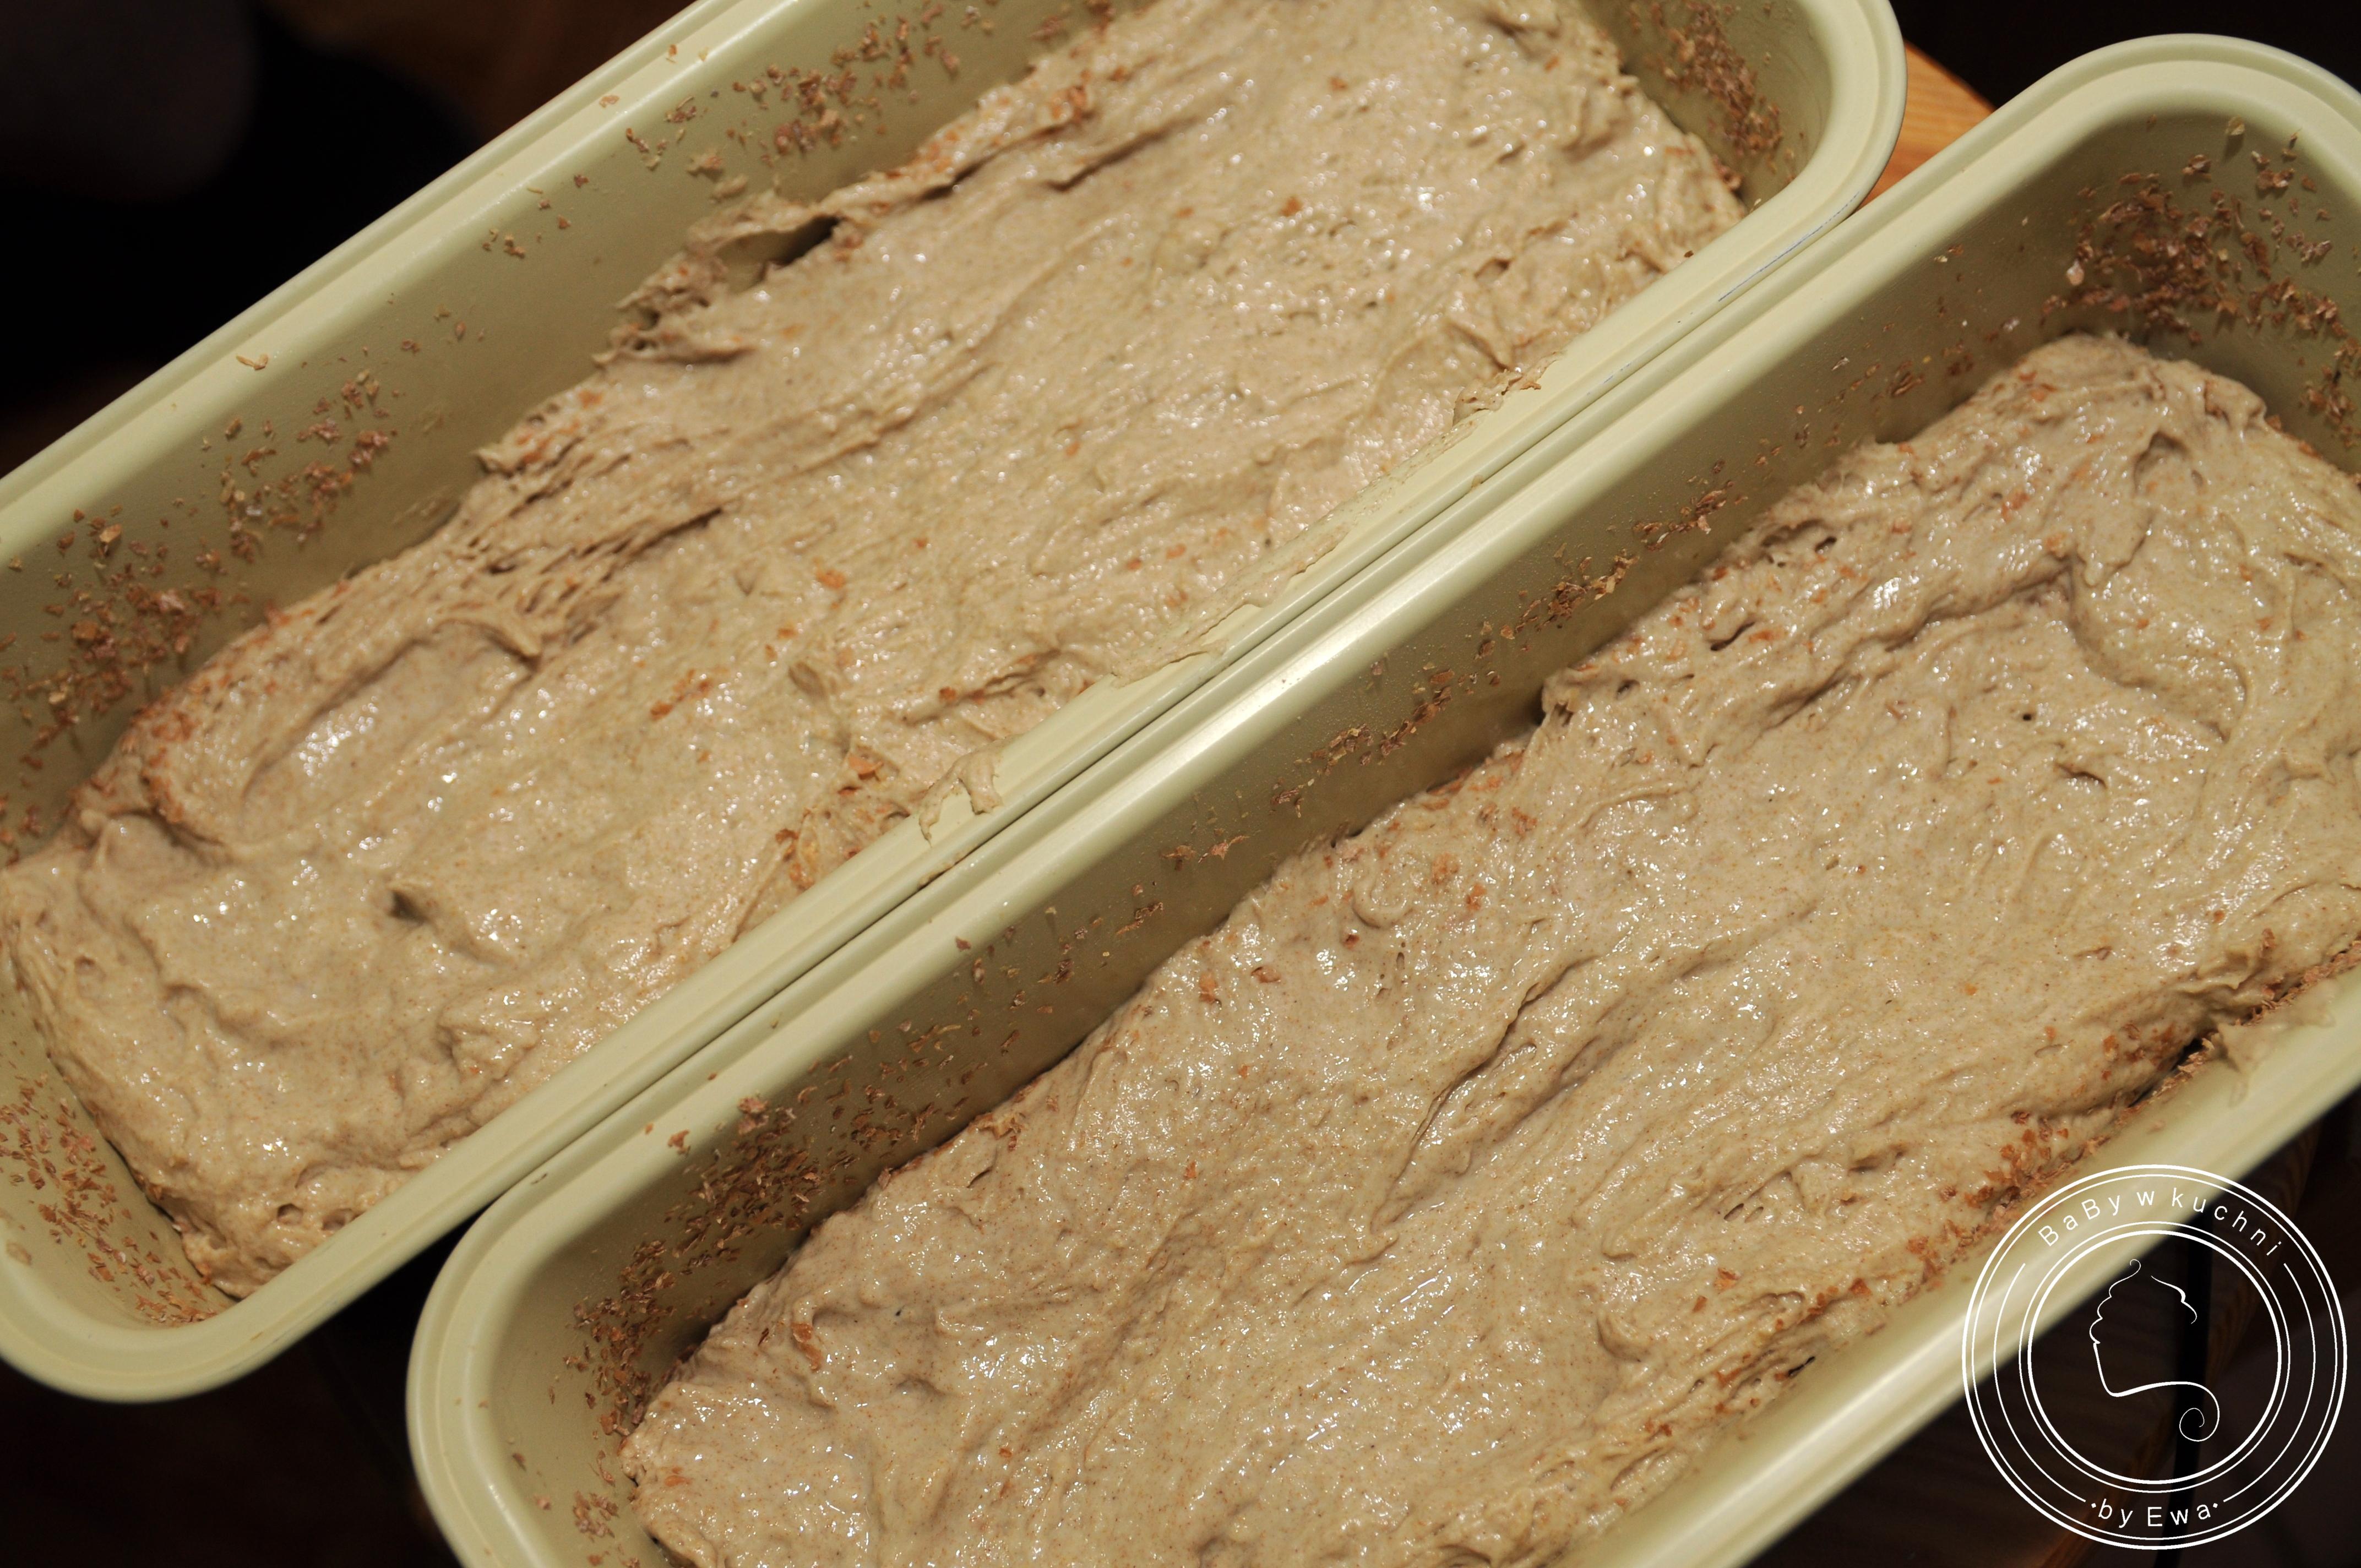 Chleb pszenno-żytni na zakwasie